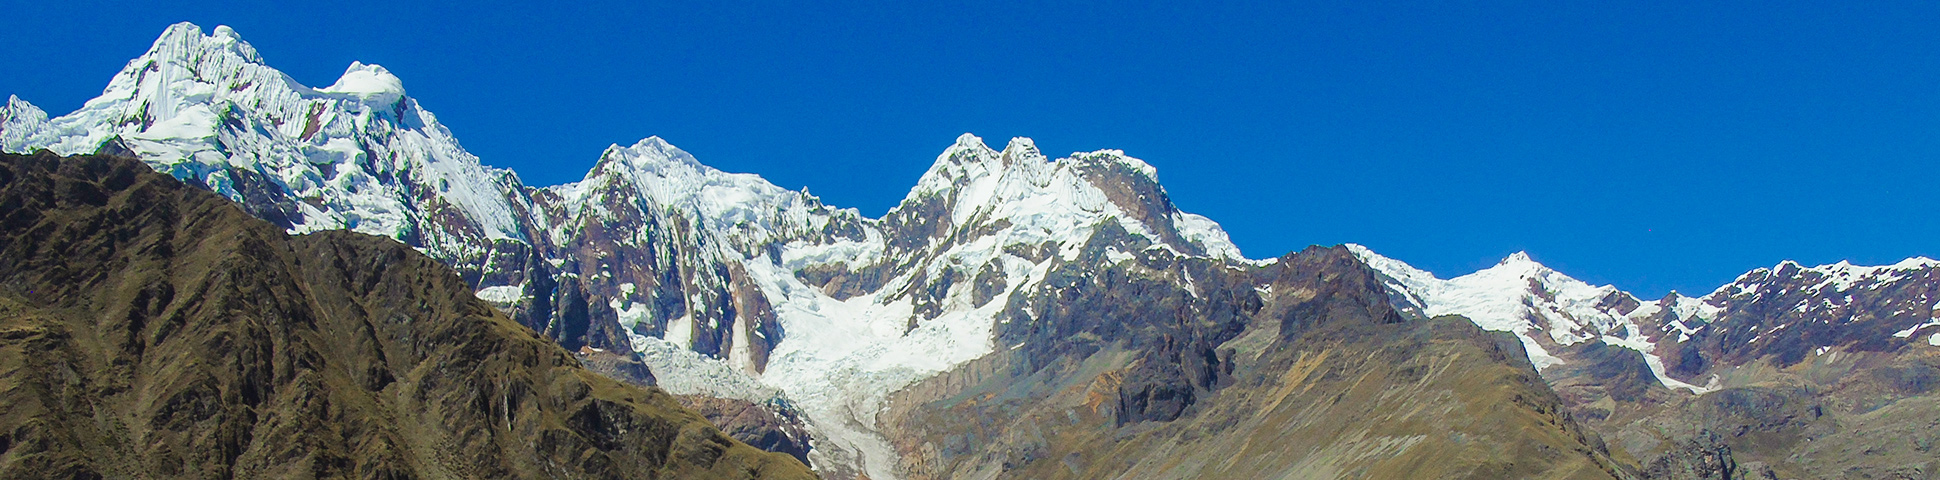 Panoramic view of white peaks along Alpamayo trek in Cordillera Blanca, Peru